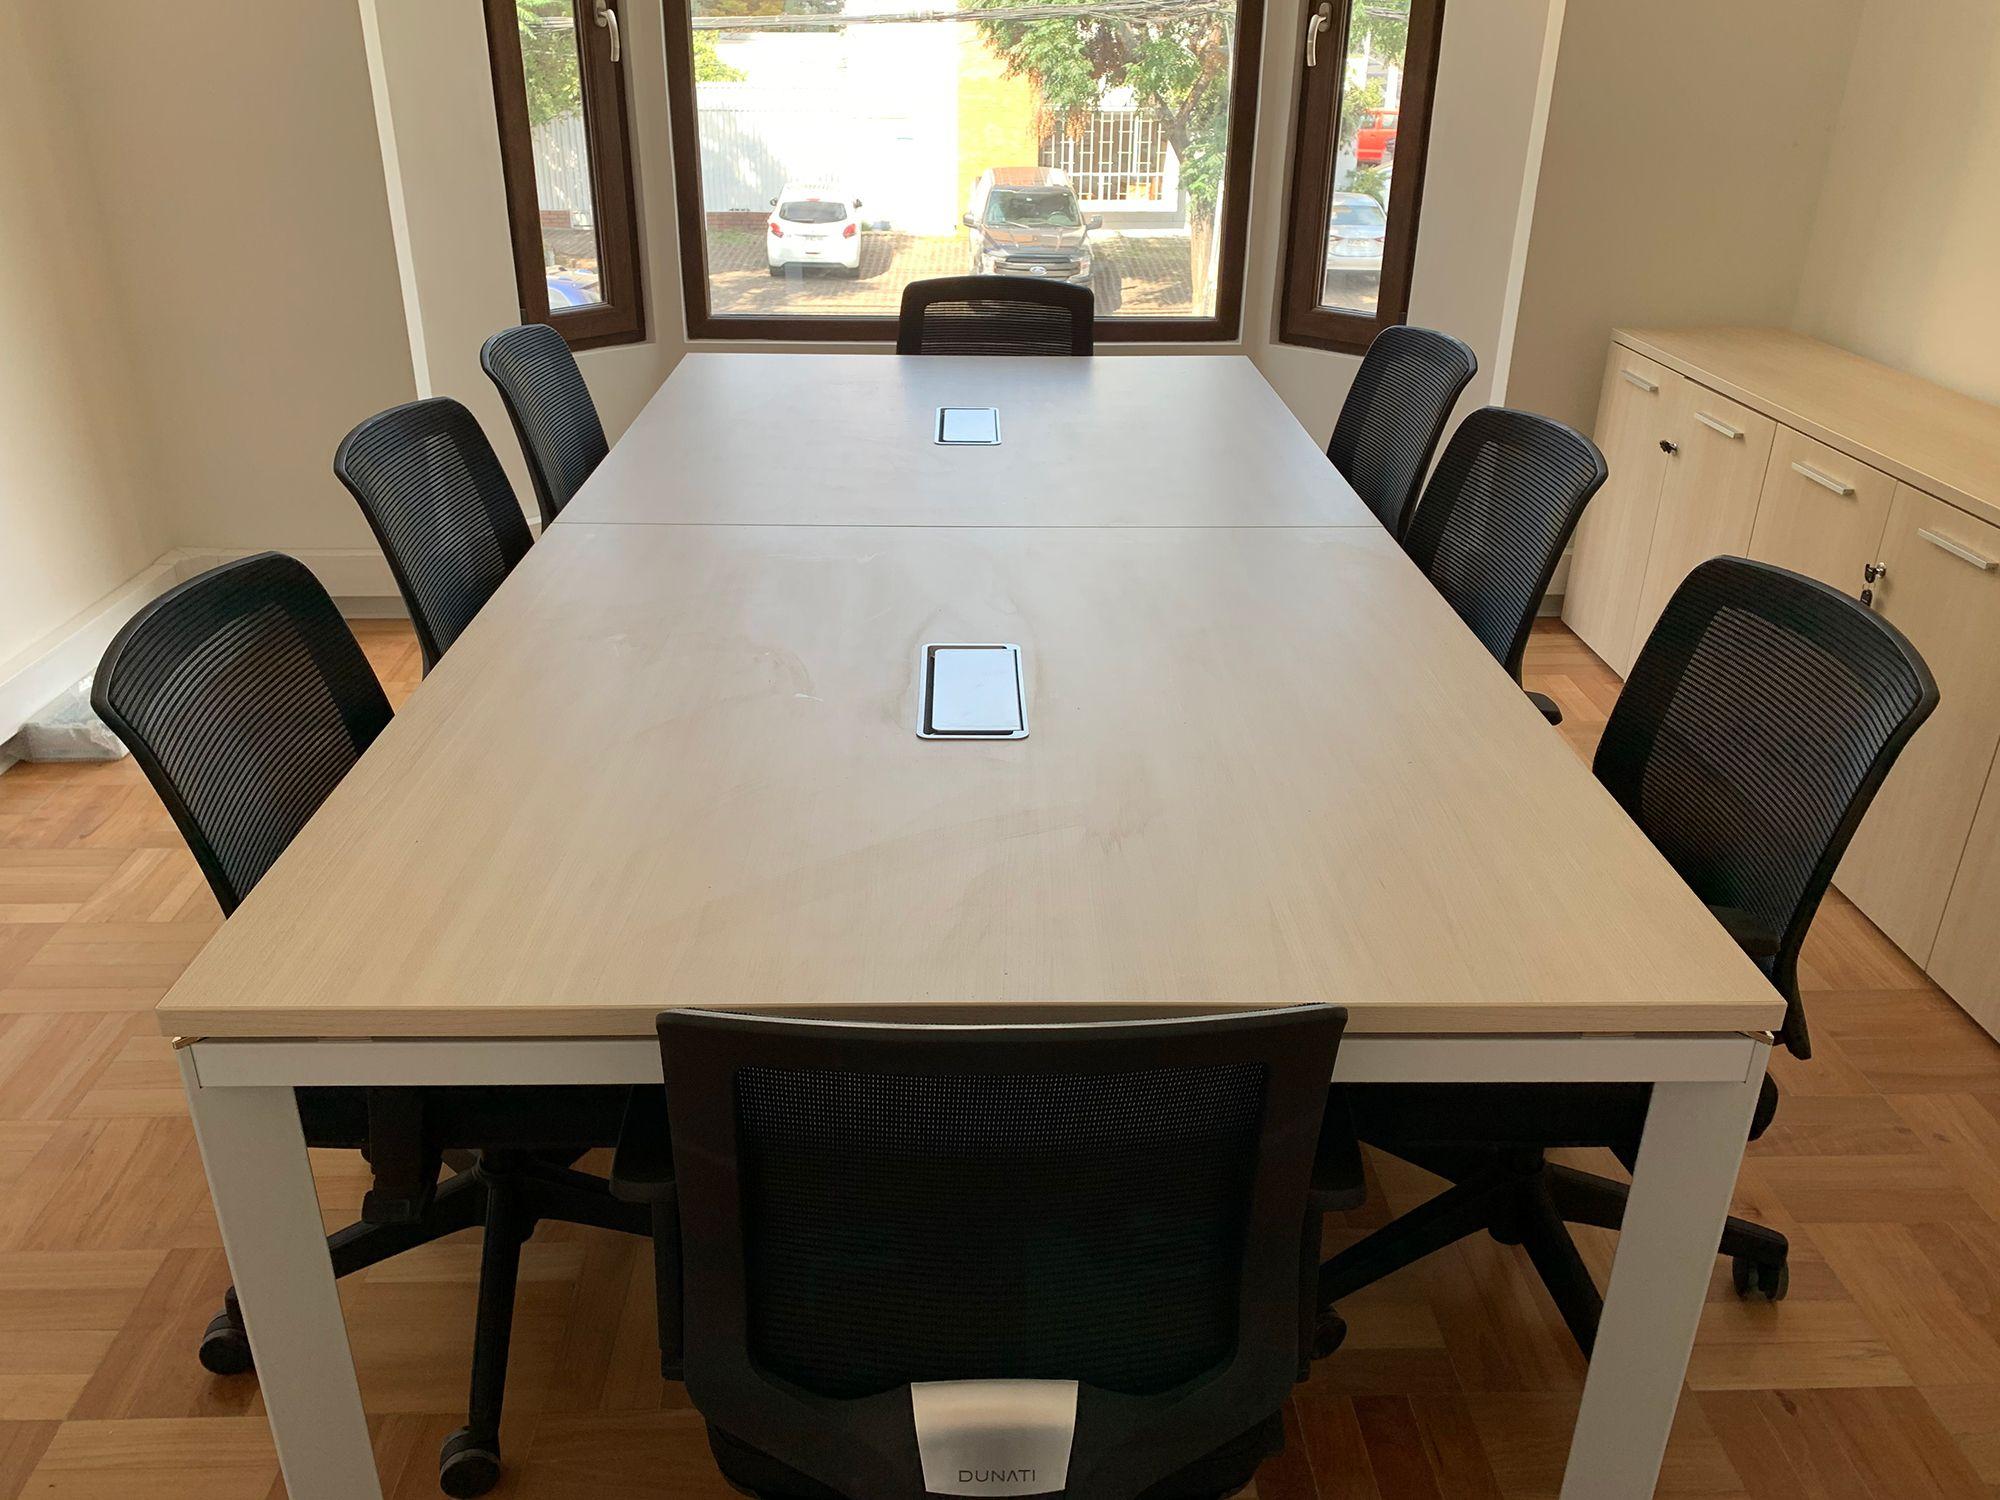 mesa de conferencia versa silla cooper